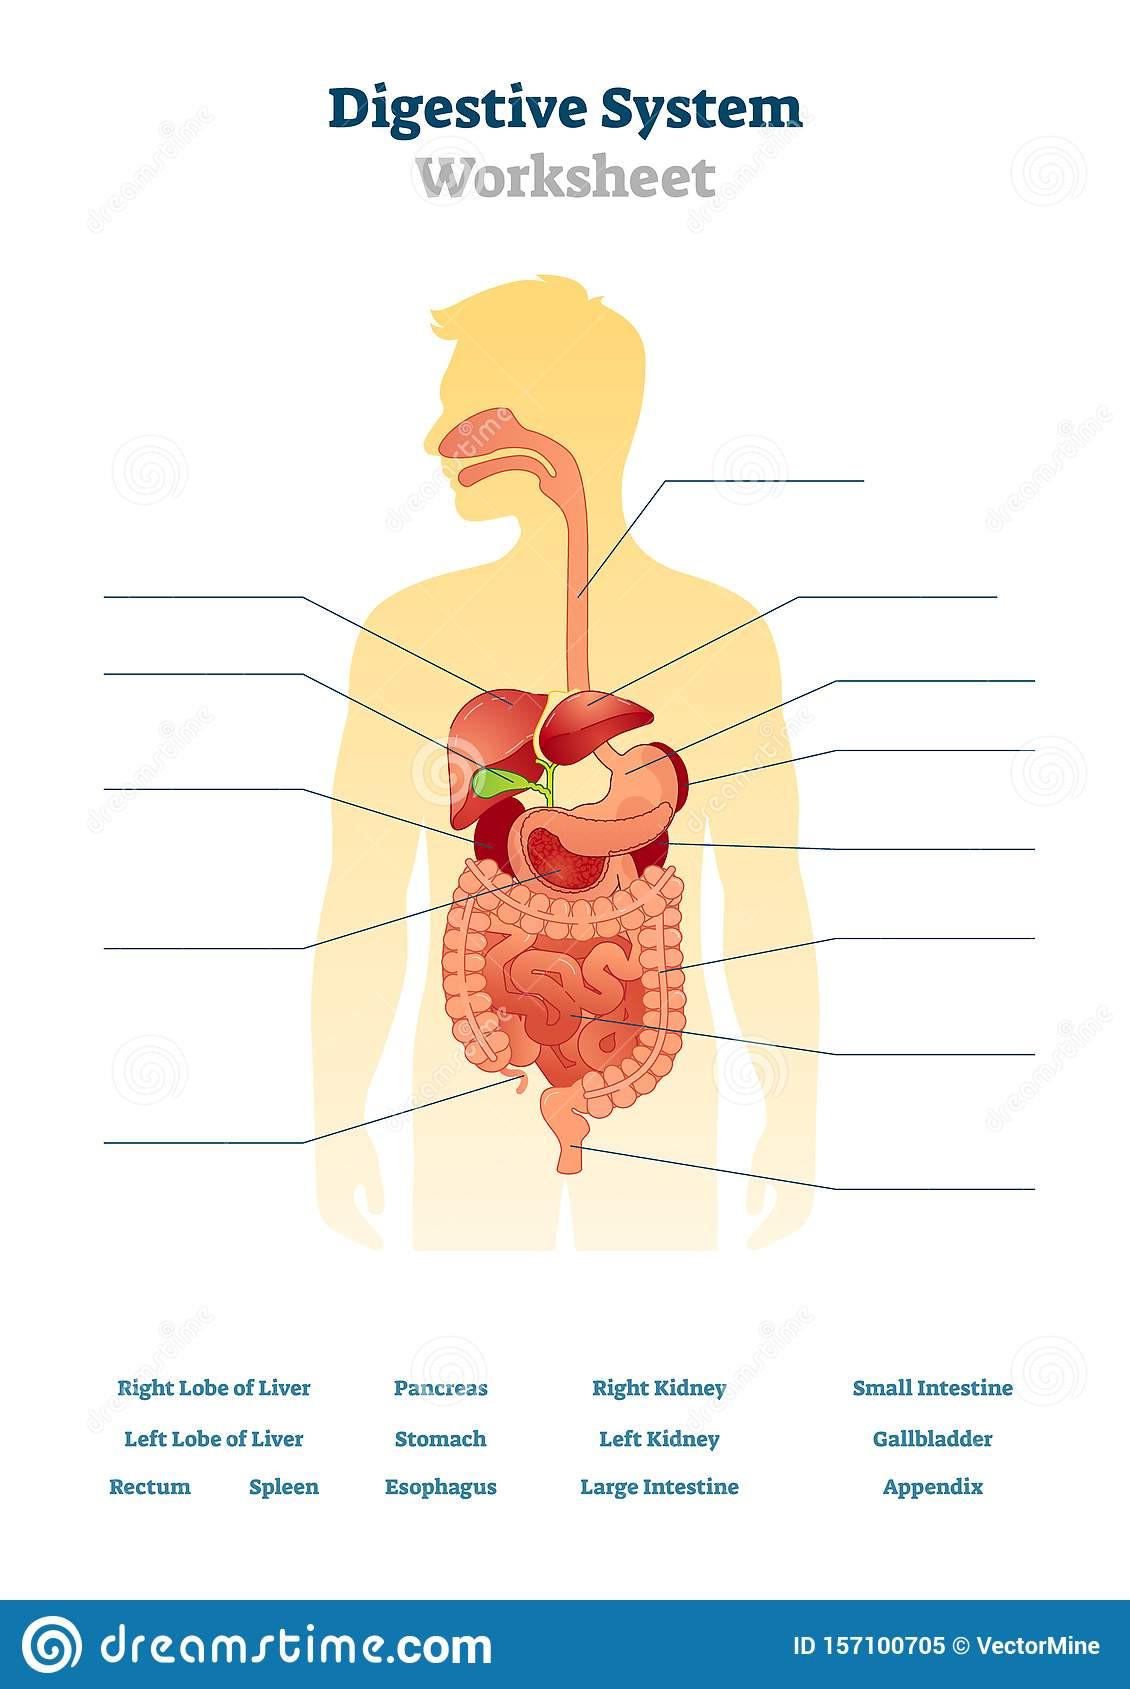 Digestive System Worksheet Answers Digestive System Worksheet Vector Illustration Blank Inner